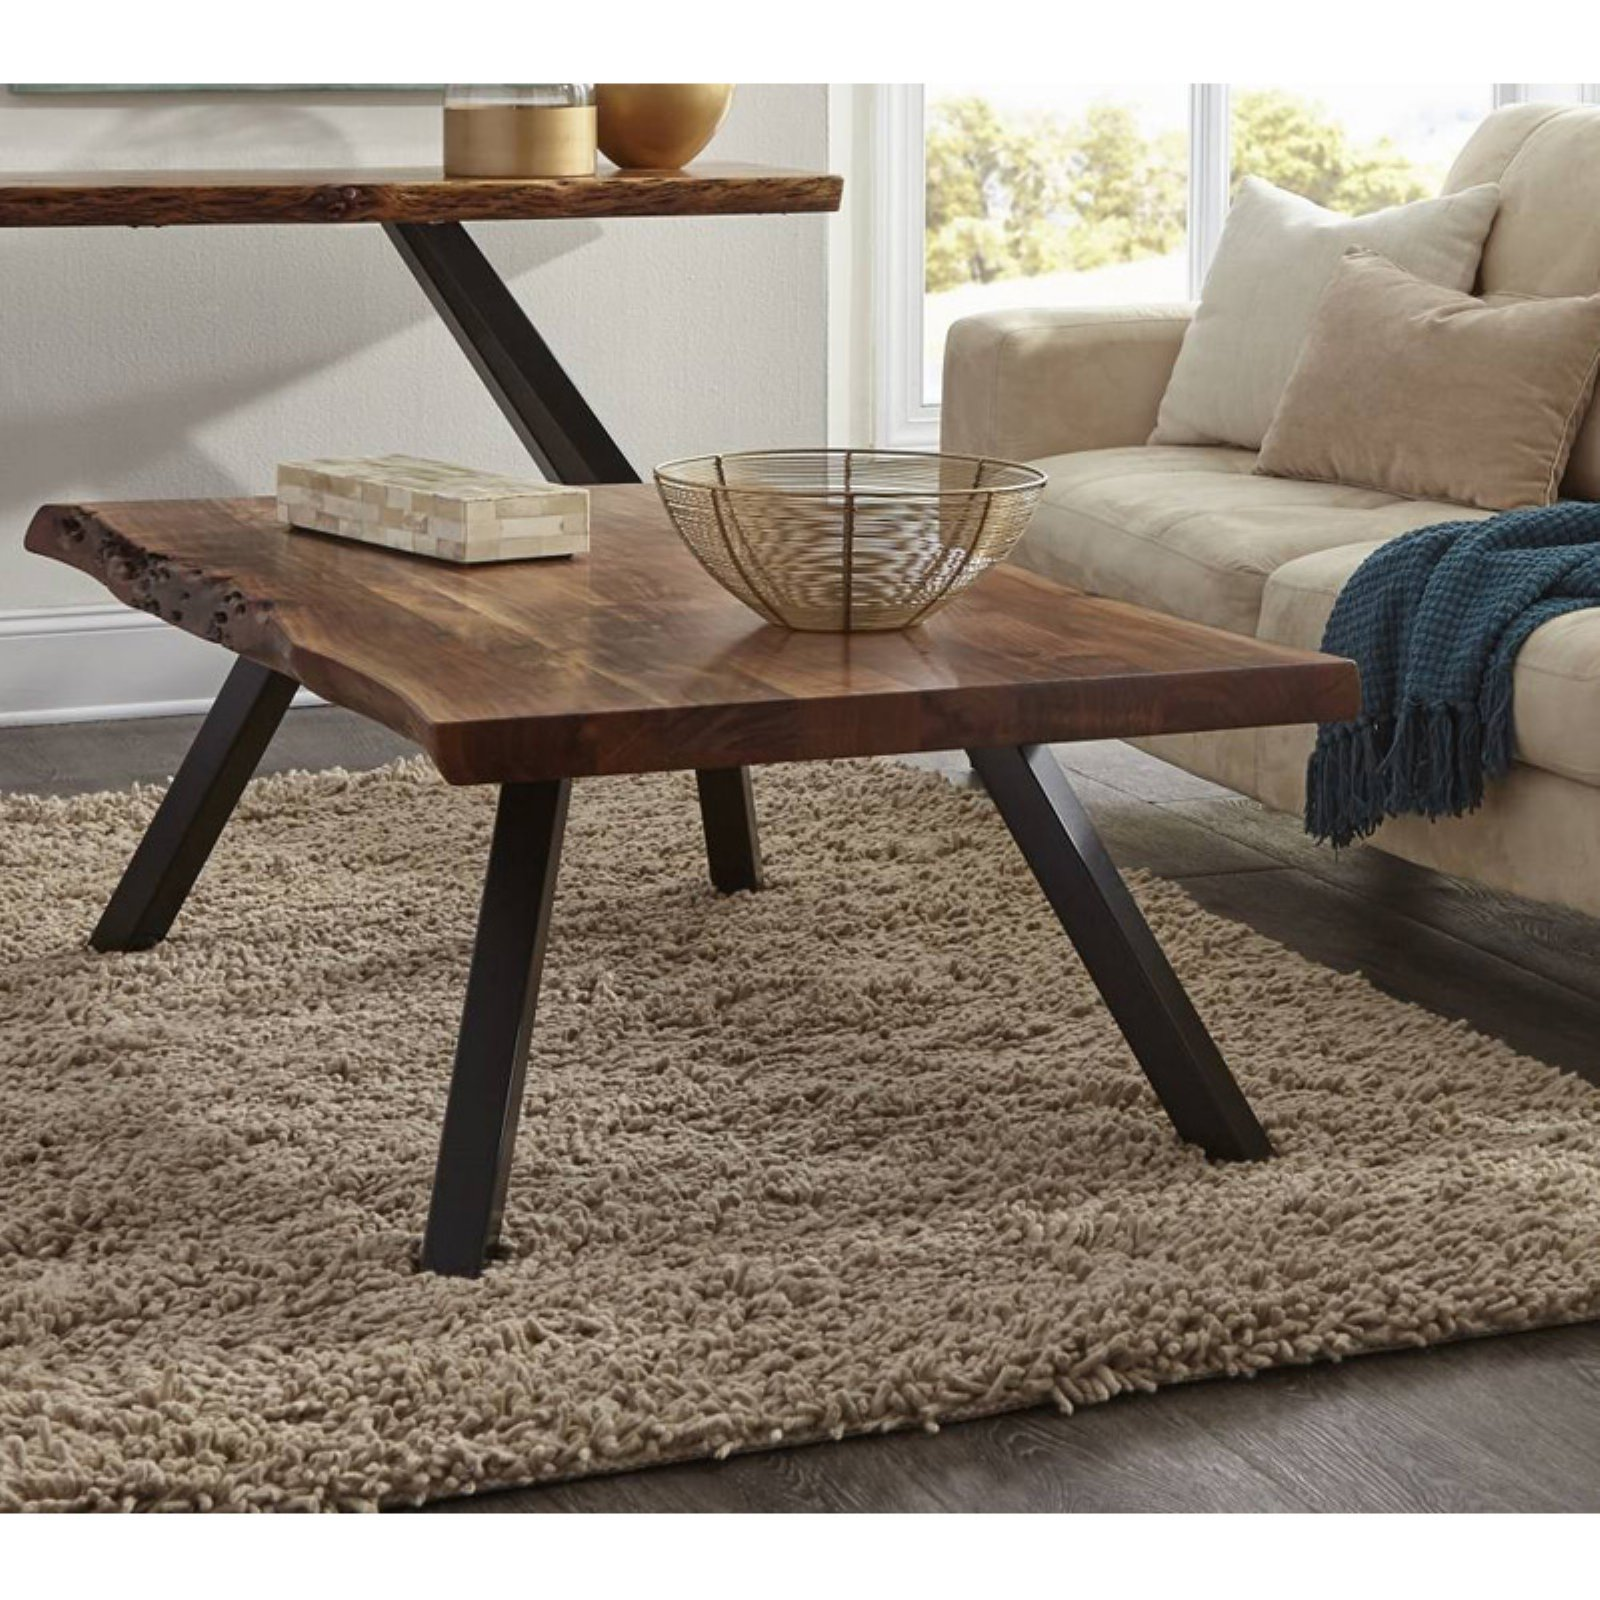 Modus Reese Rectangular Coffee Table In 2021 Coffee Table Live Edge Coffee Table Rectangular Coffee Table [ 1600 x 1600 Pixel ]